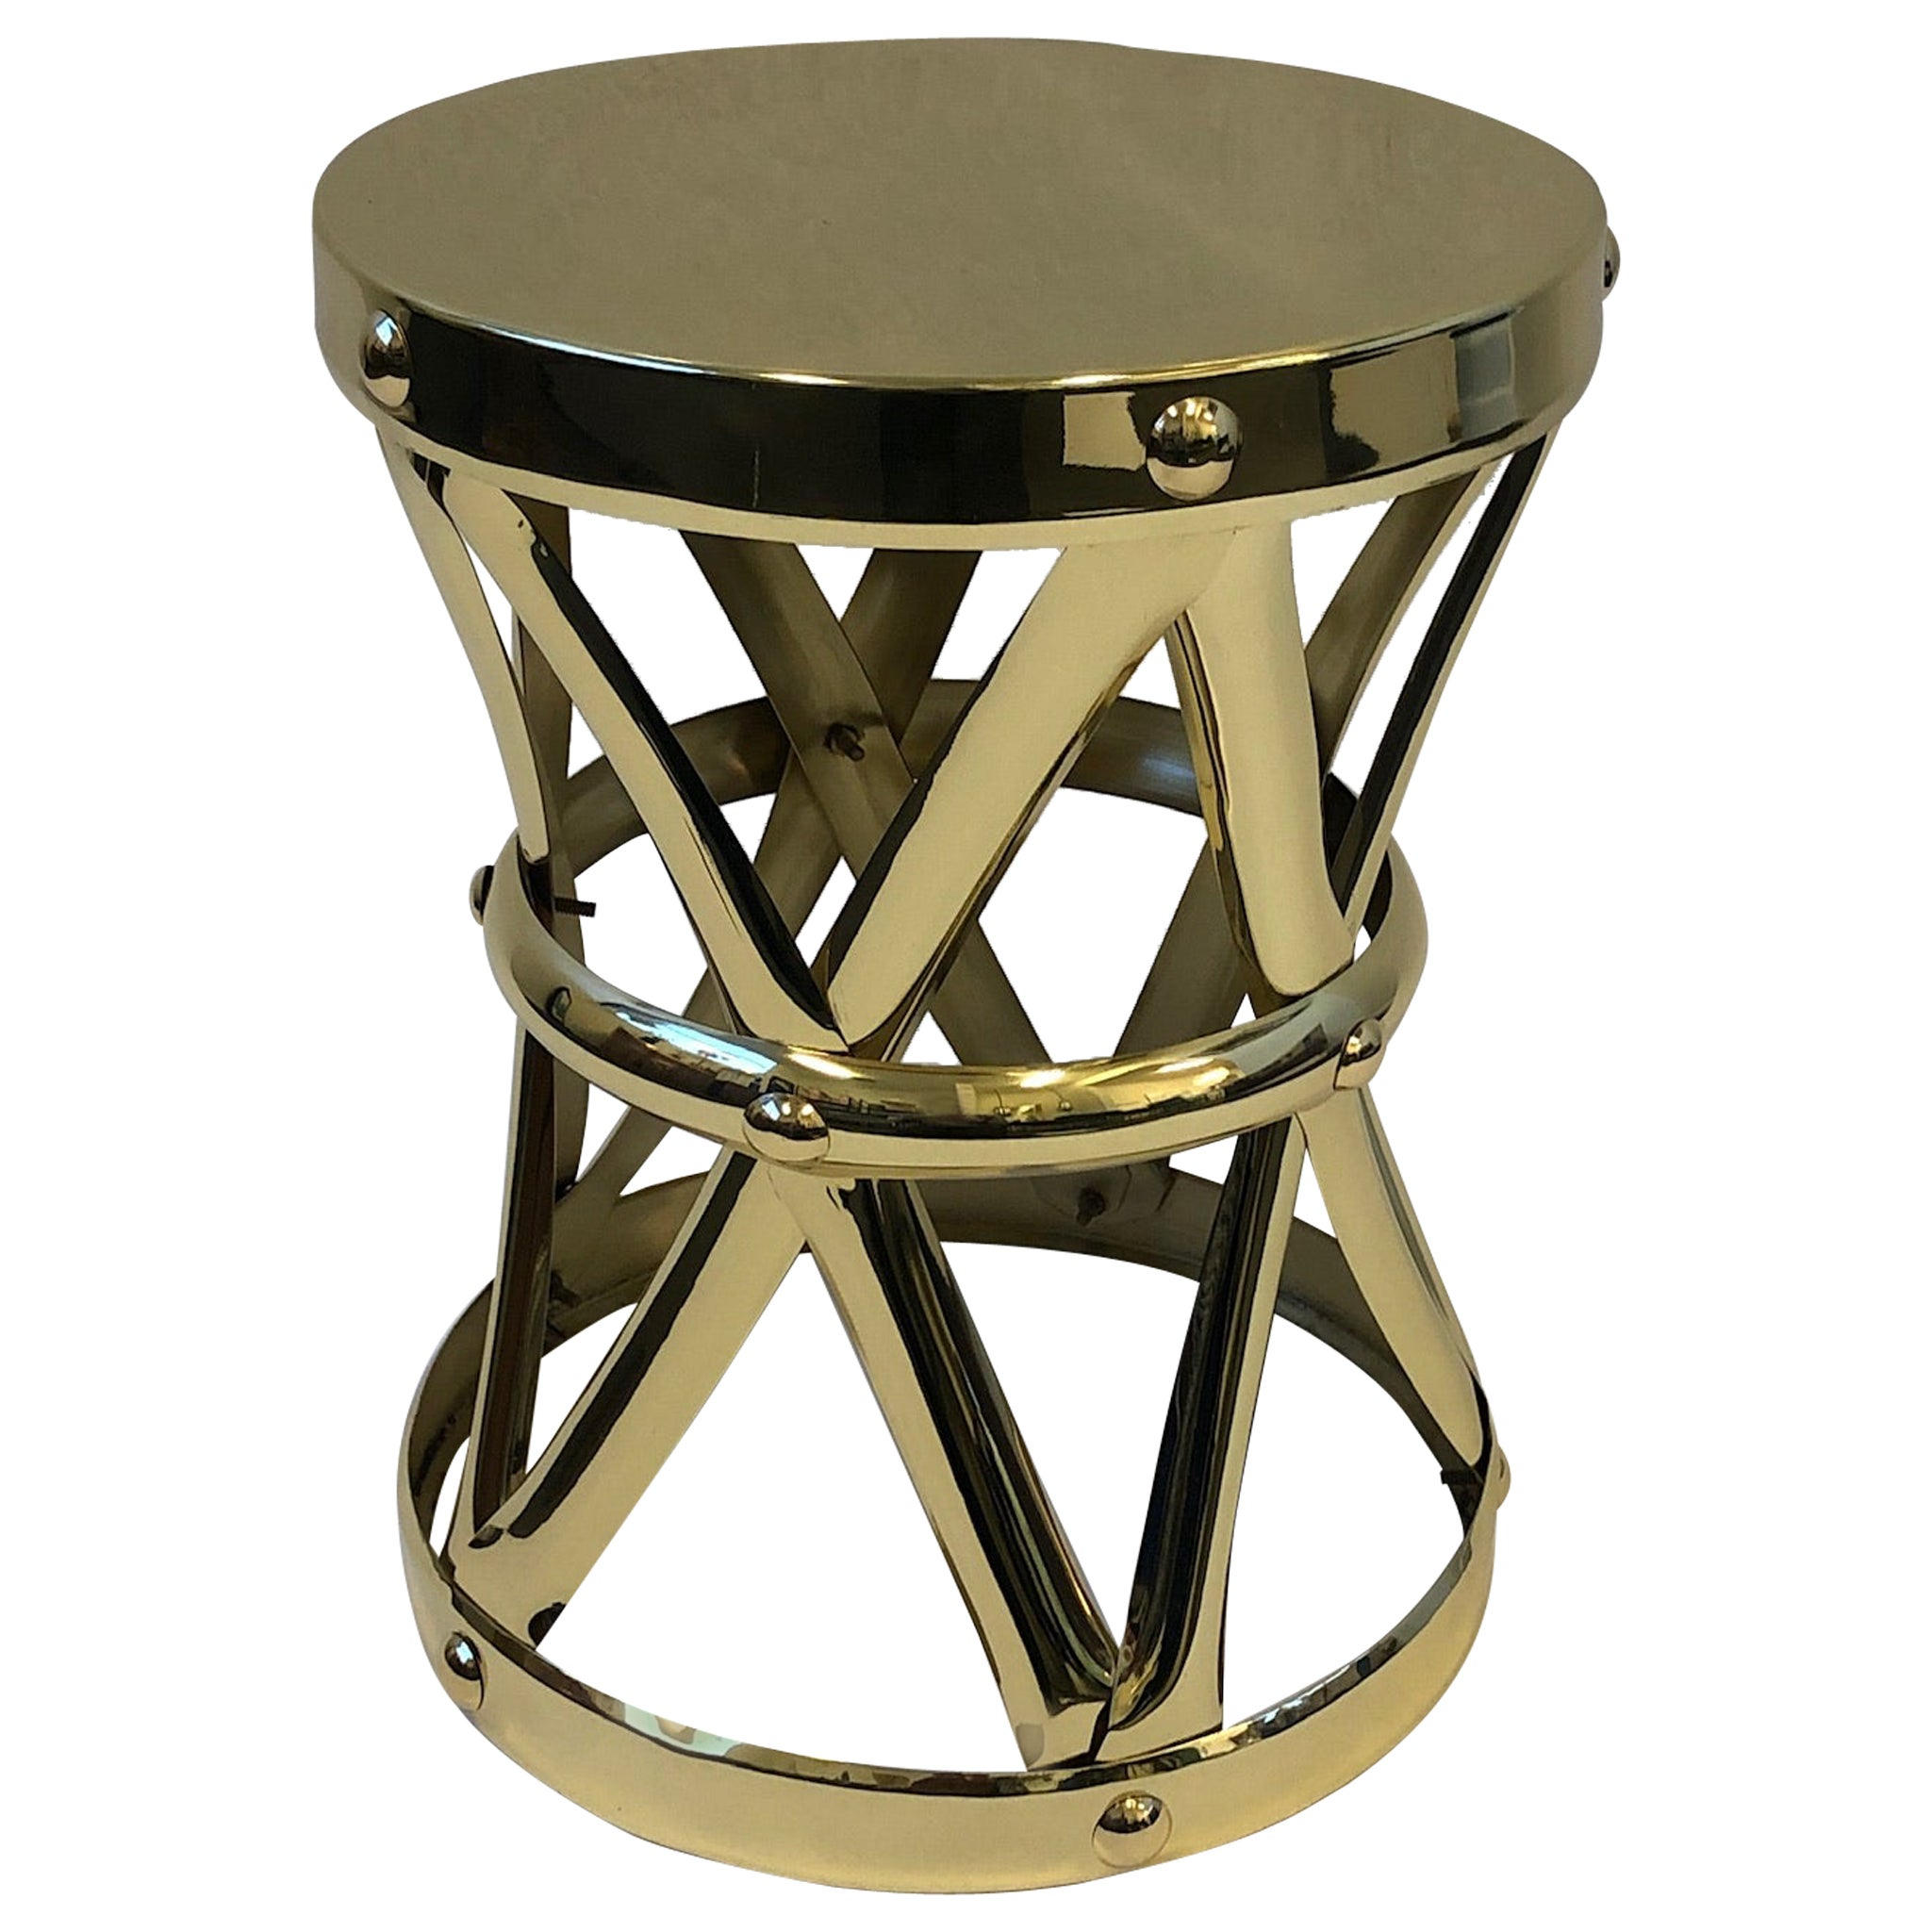 Spanish Brass Drum Occasional Side Table by Sarreid Ltd.